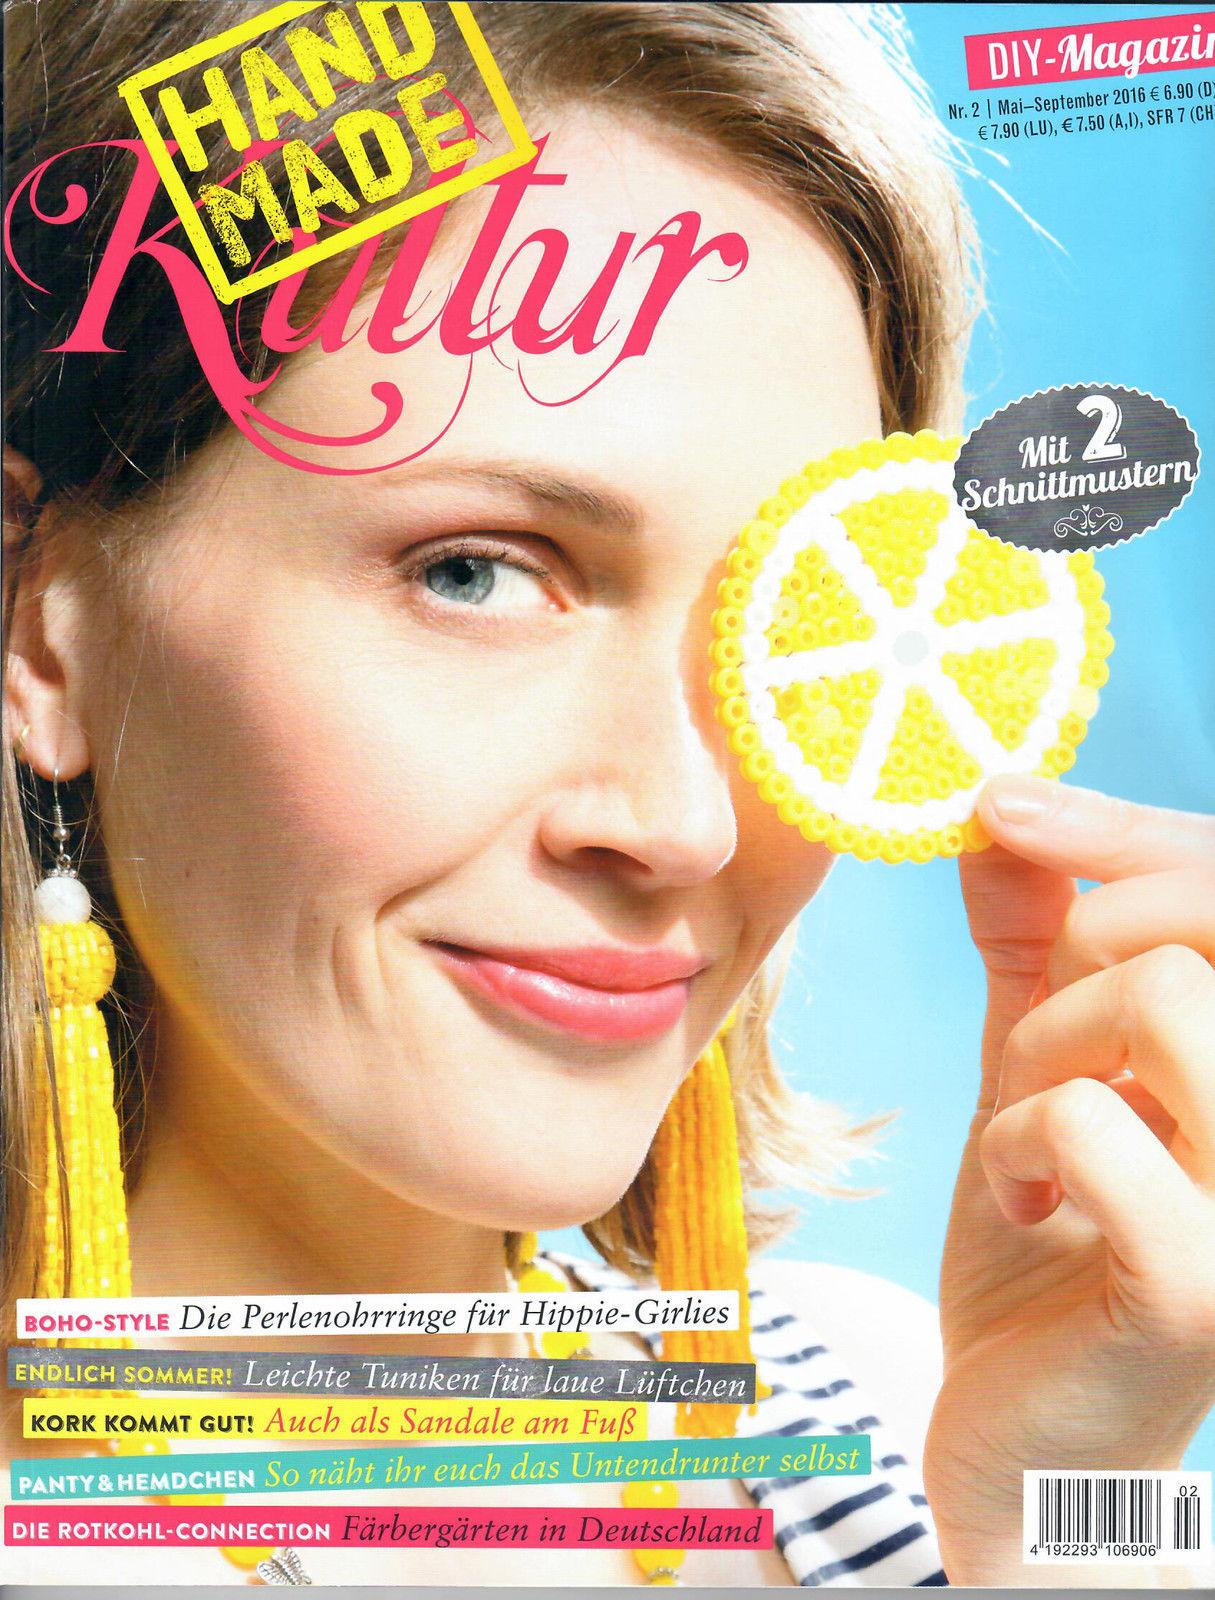 hand made kultur, ausgabe nr.2 mai - sept.2016 diy-magazin mit 2